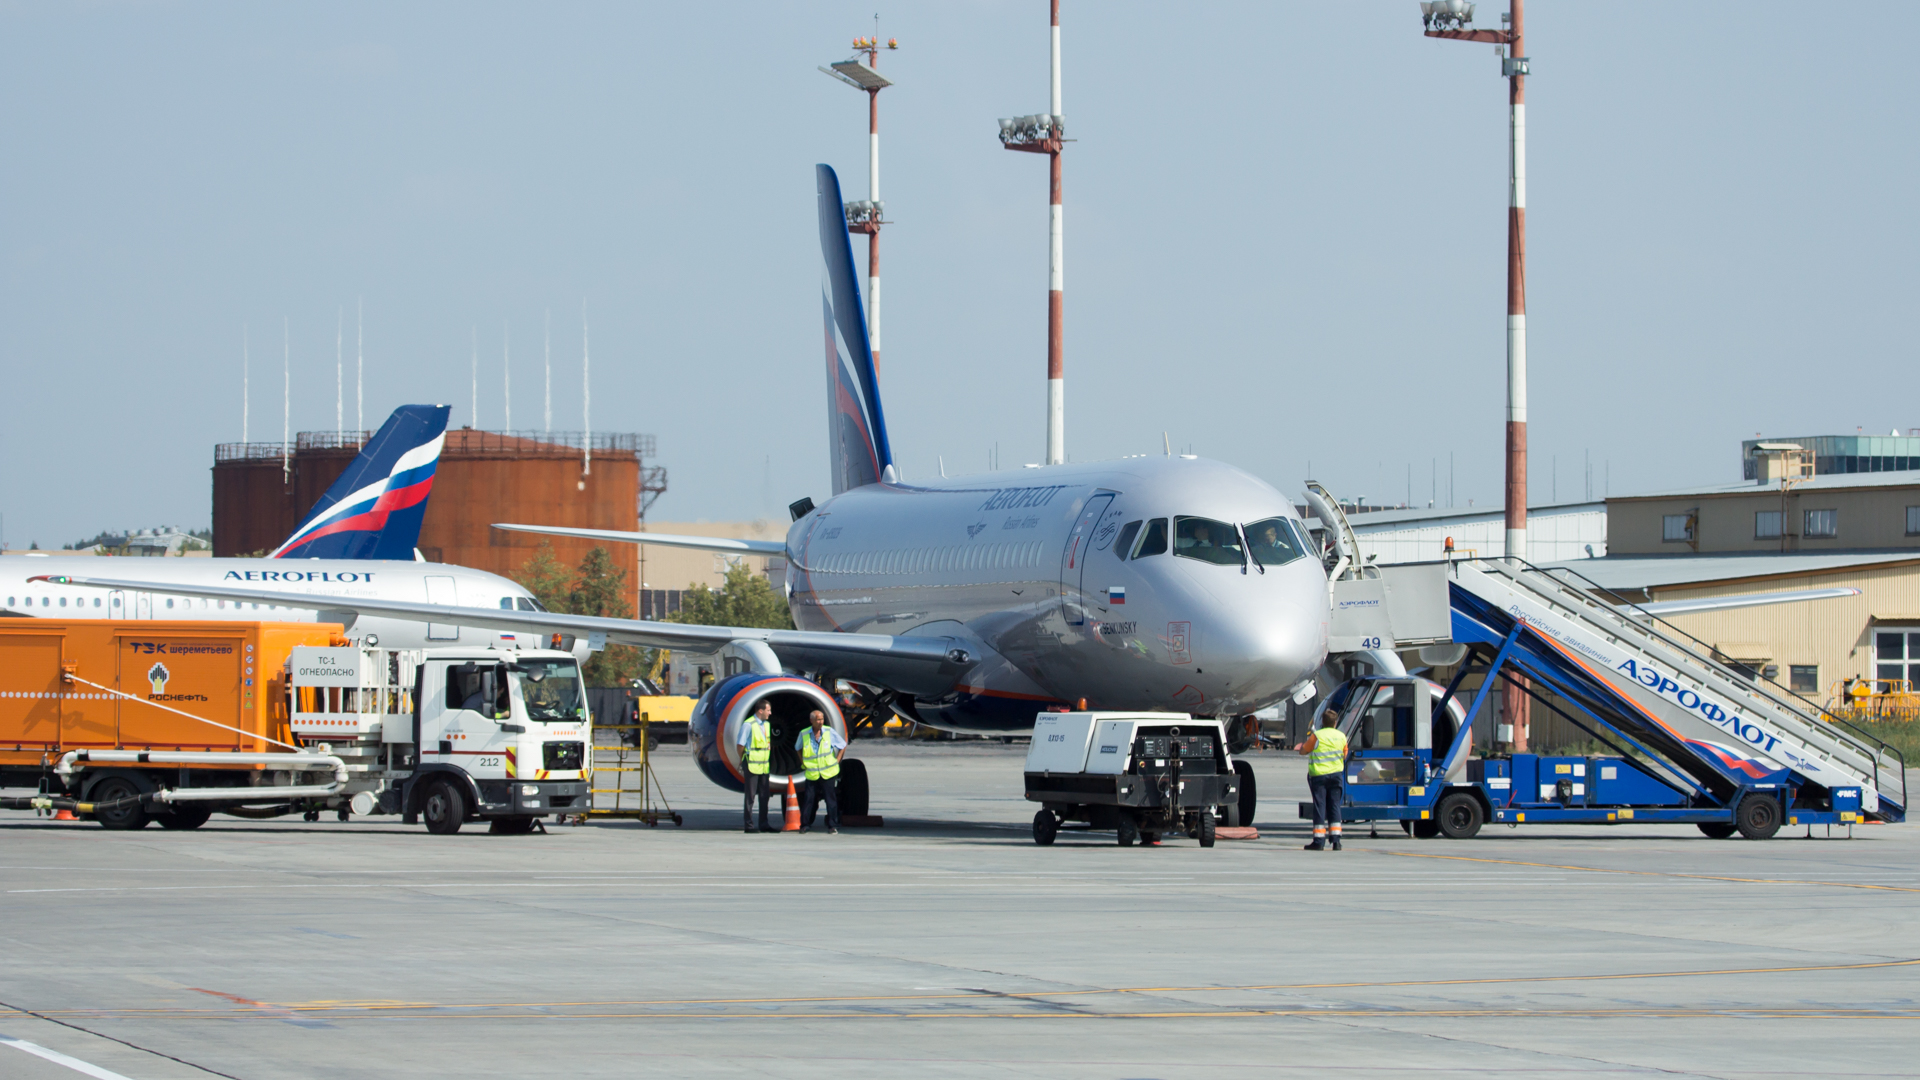 Sukhoi Superjet-100 - RA-89026